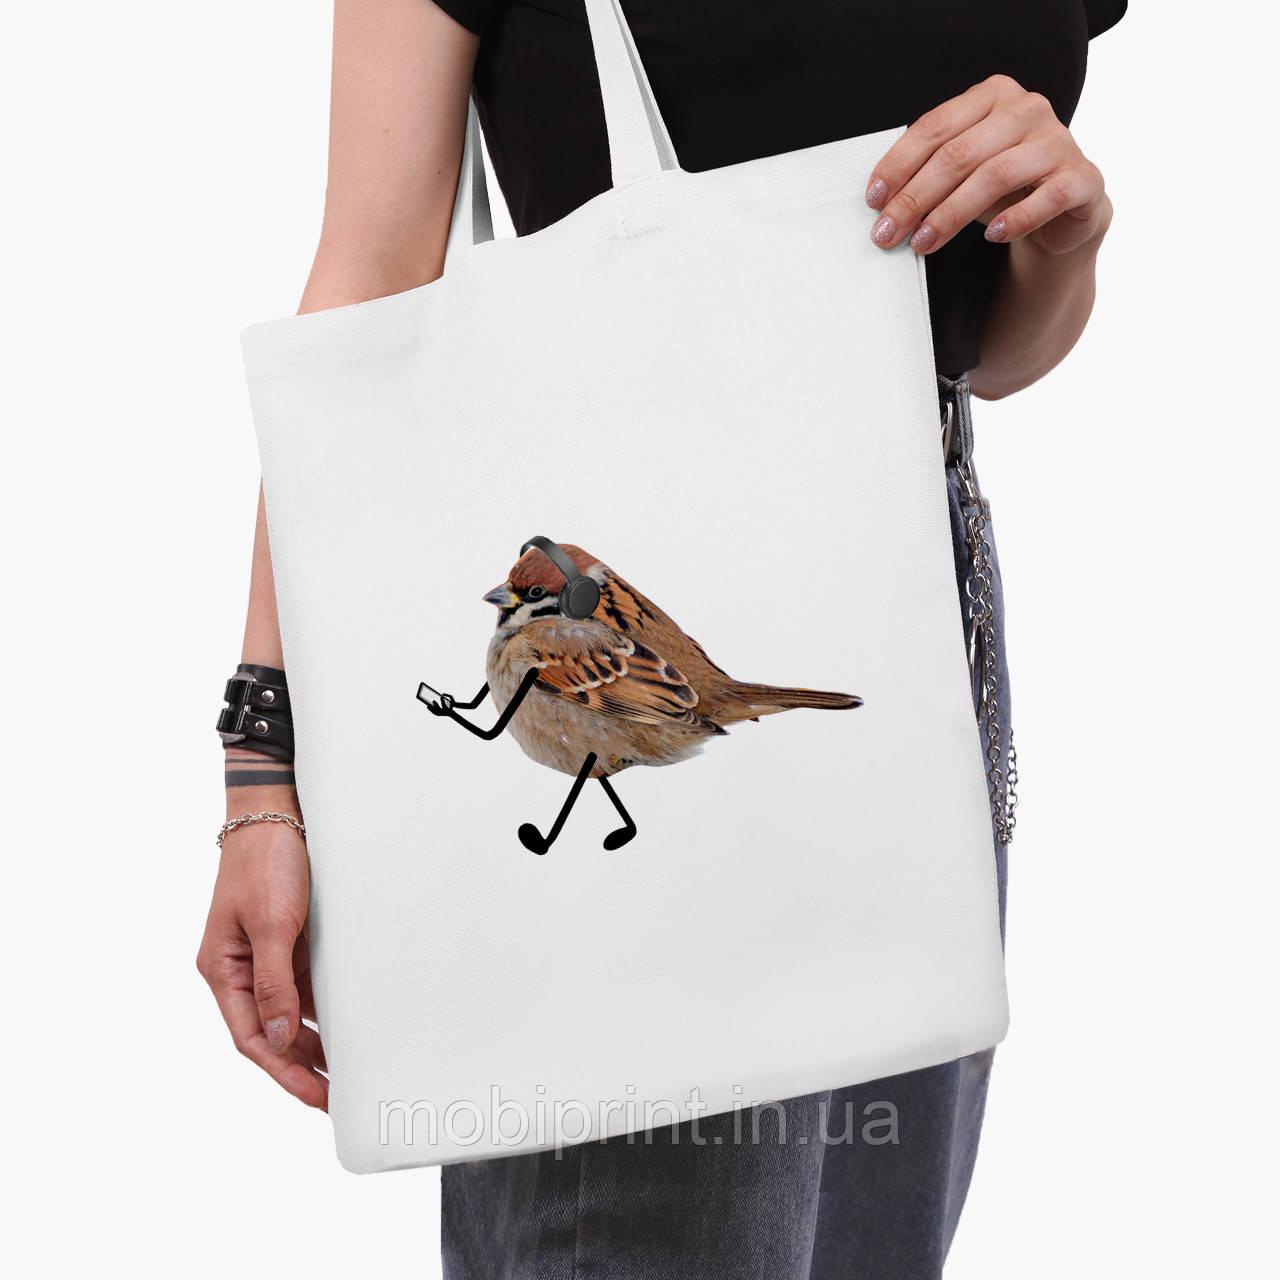 Эко сумка шоппер белая Птицы SWAG (9227-1539-3)  41*35 см